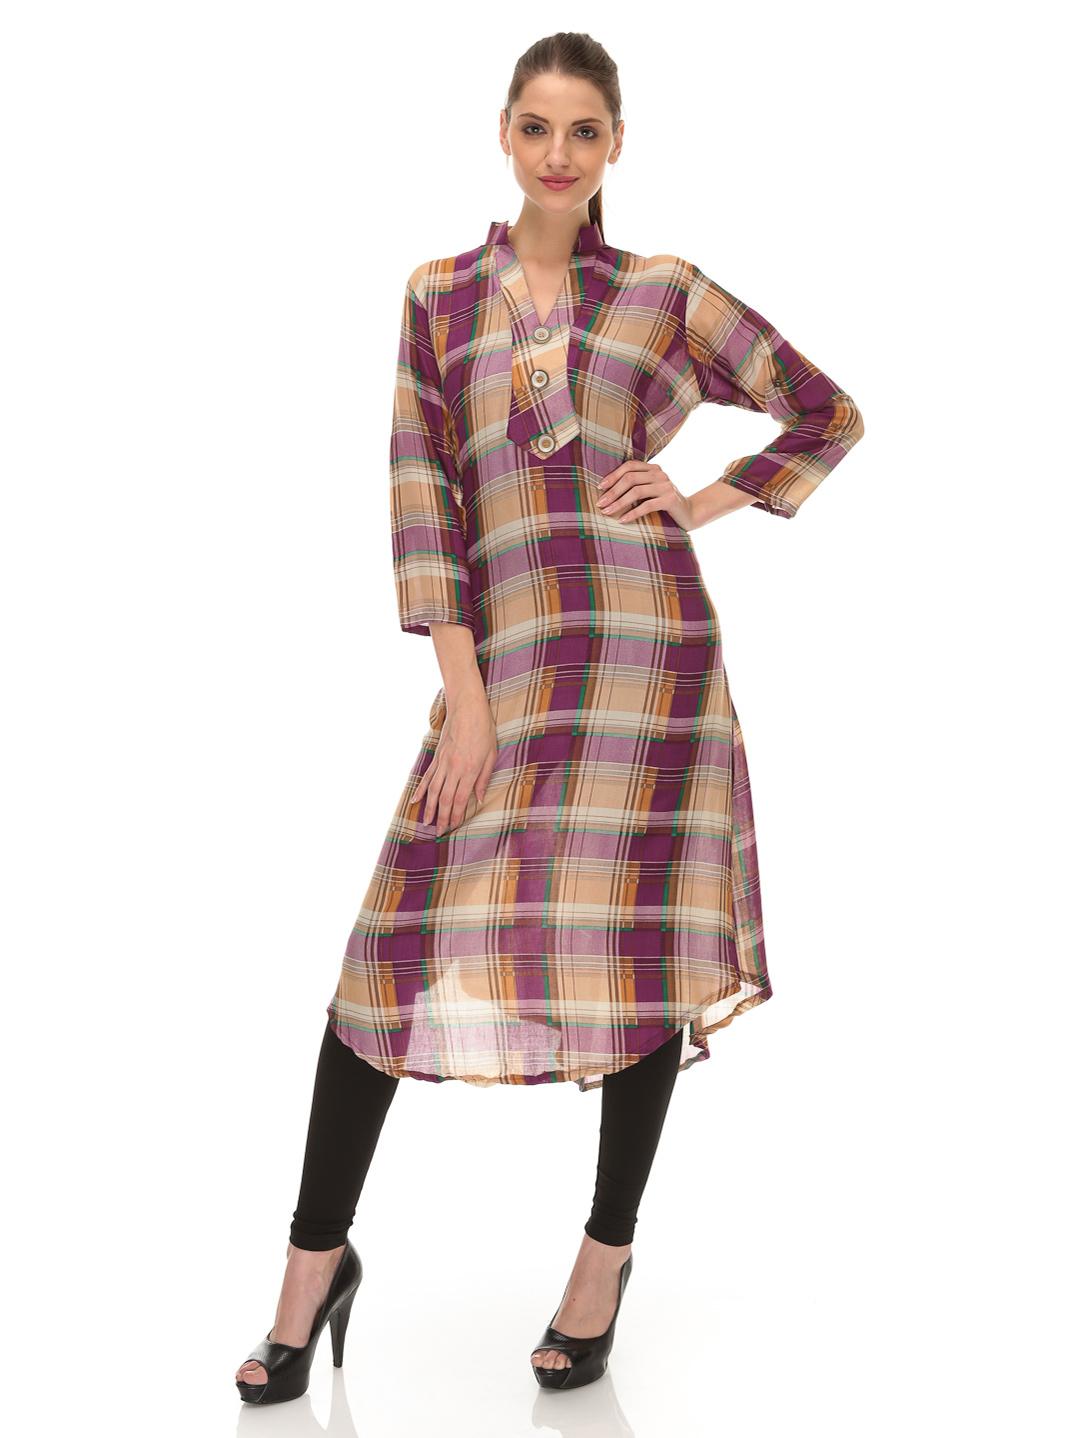 Arzu Gul Clothing New Long Tunics Shirt Fashion 2013